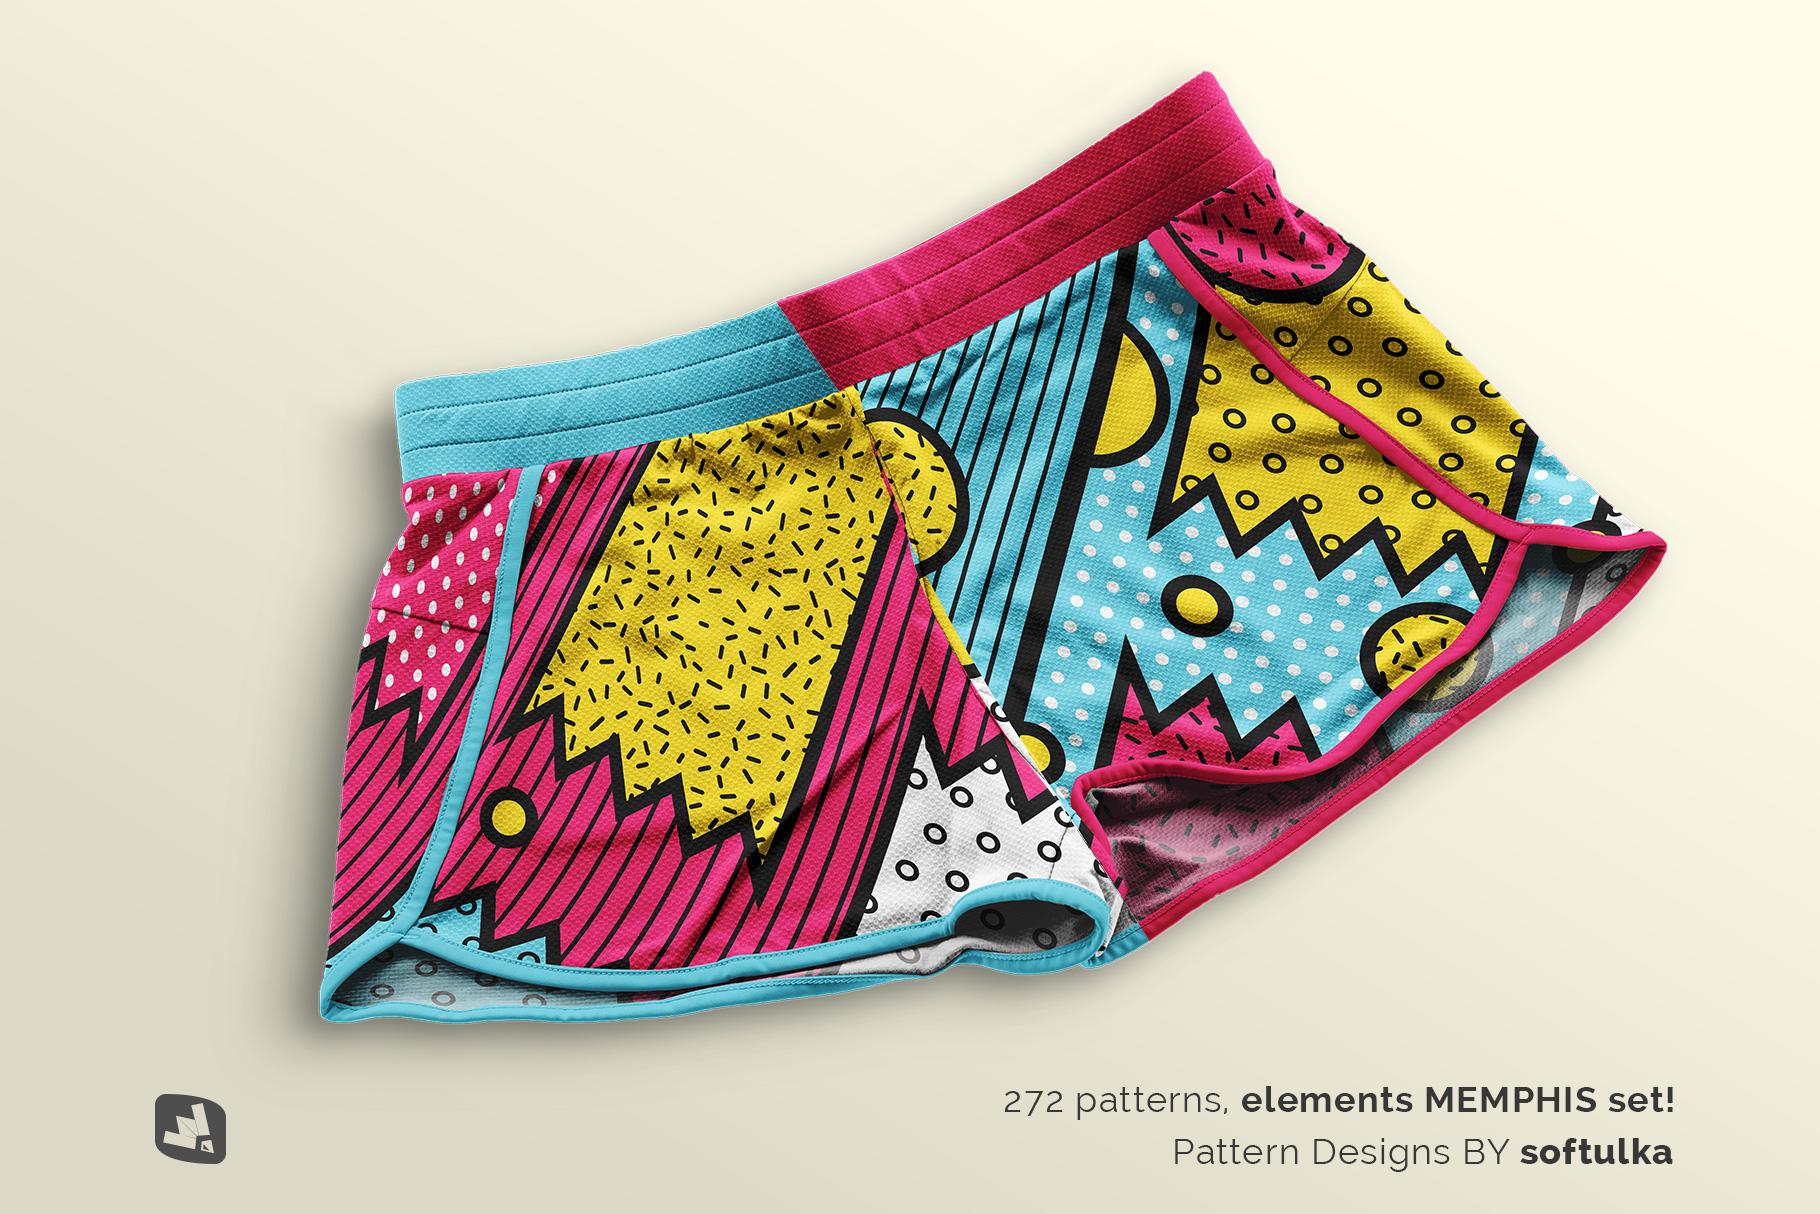 designer's credit of the female sportswear shorts mockup